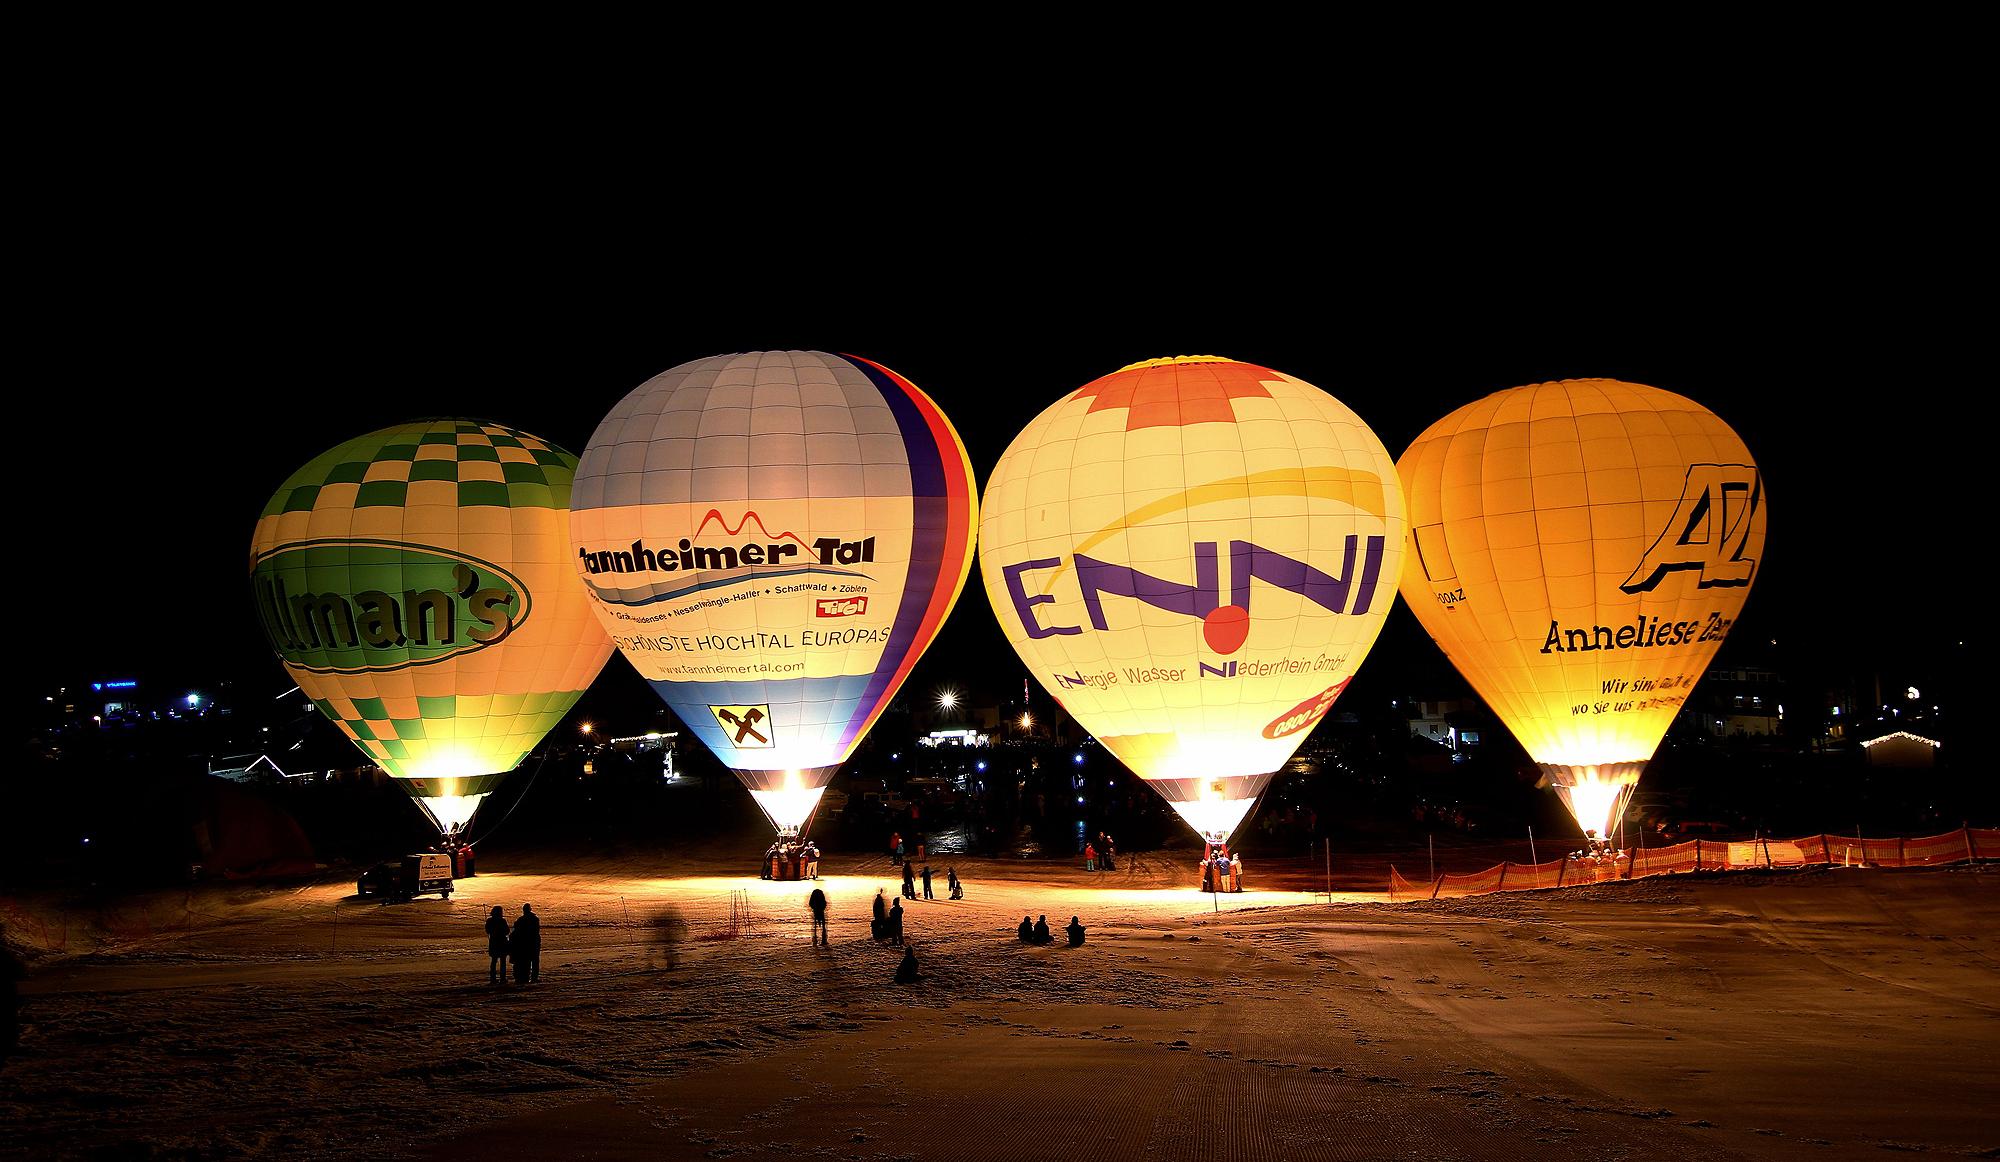 Ballonfestival Tannheimer l2